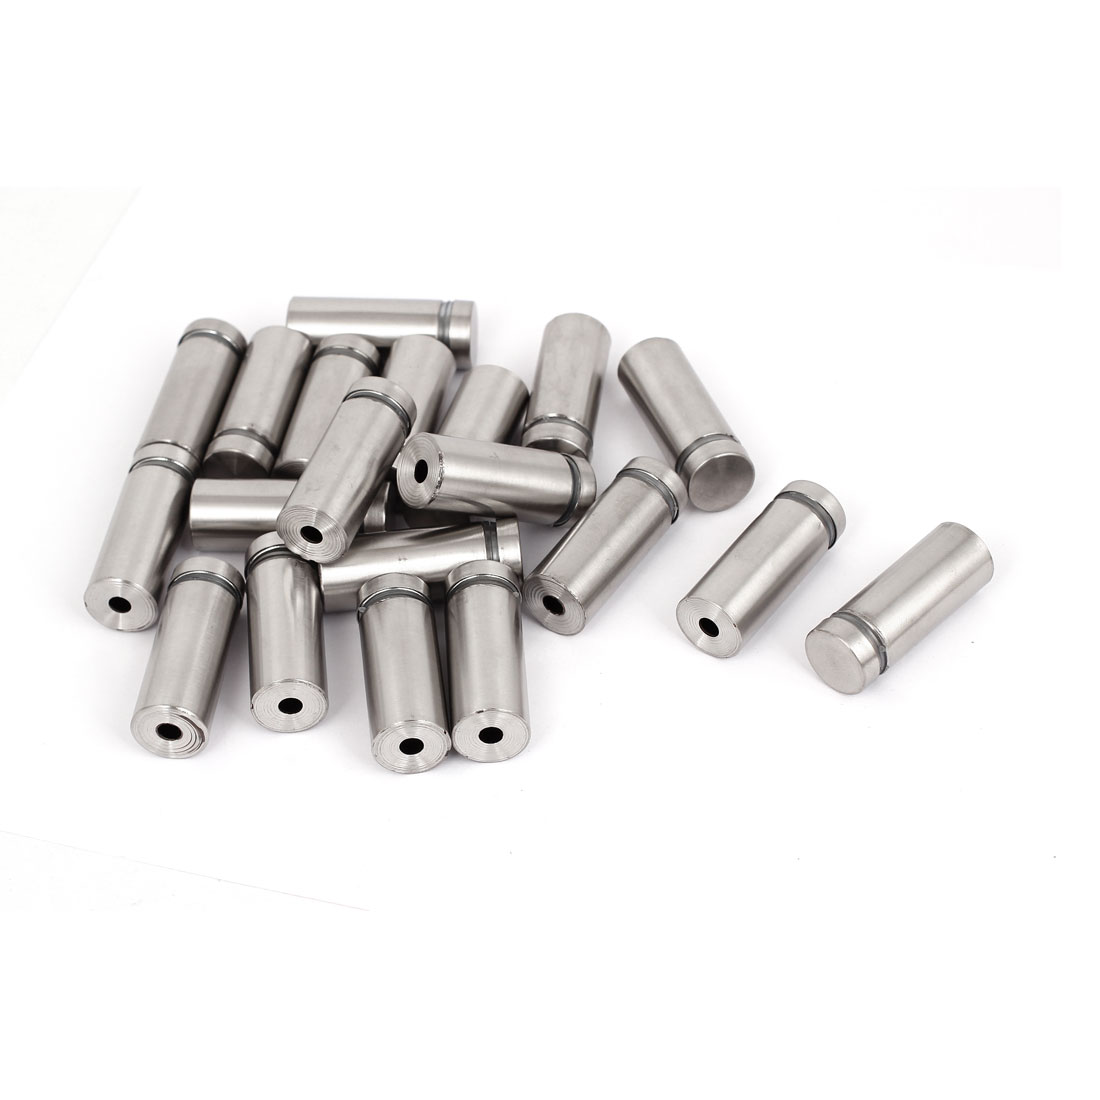 16mm x 40mm Stainless Steel Advertising Frameless Glass Standoff Pins 20pcs